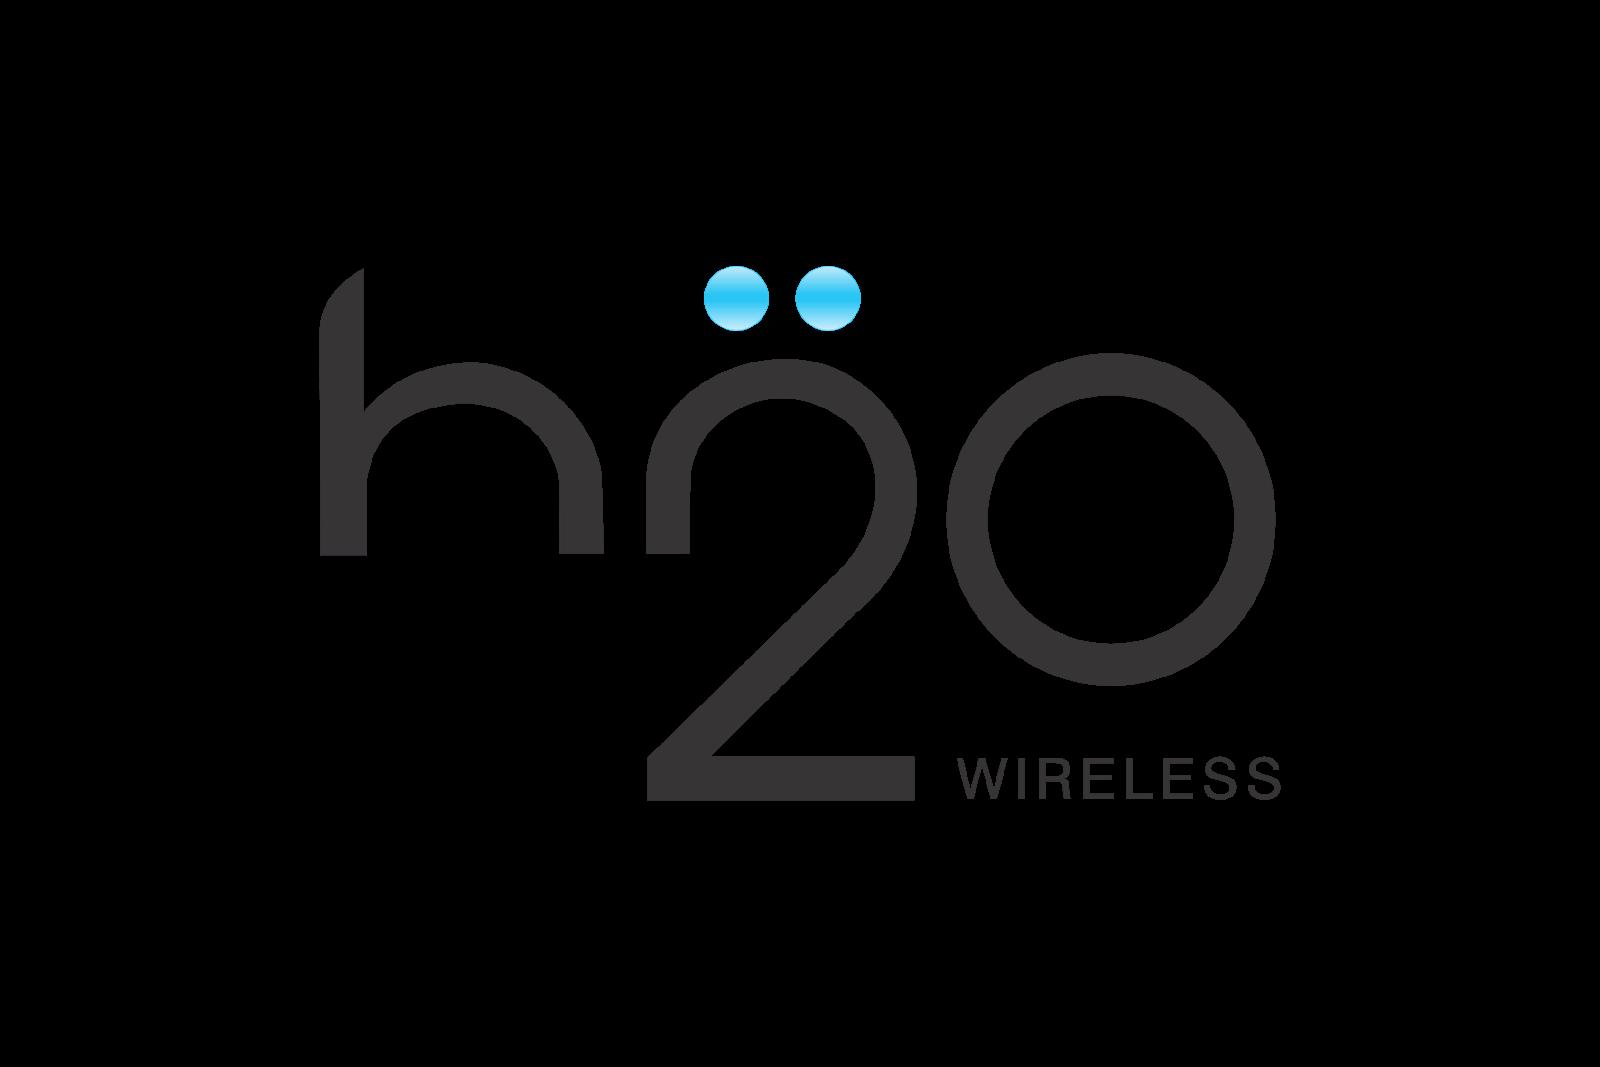 H2O Wireless Logo - Logo-Share H2o Wireless Logo Png